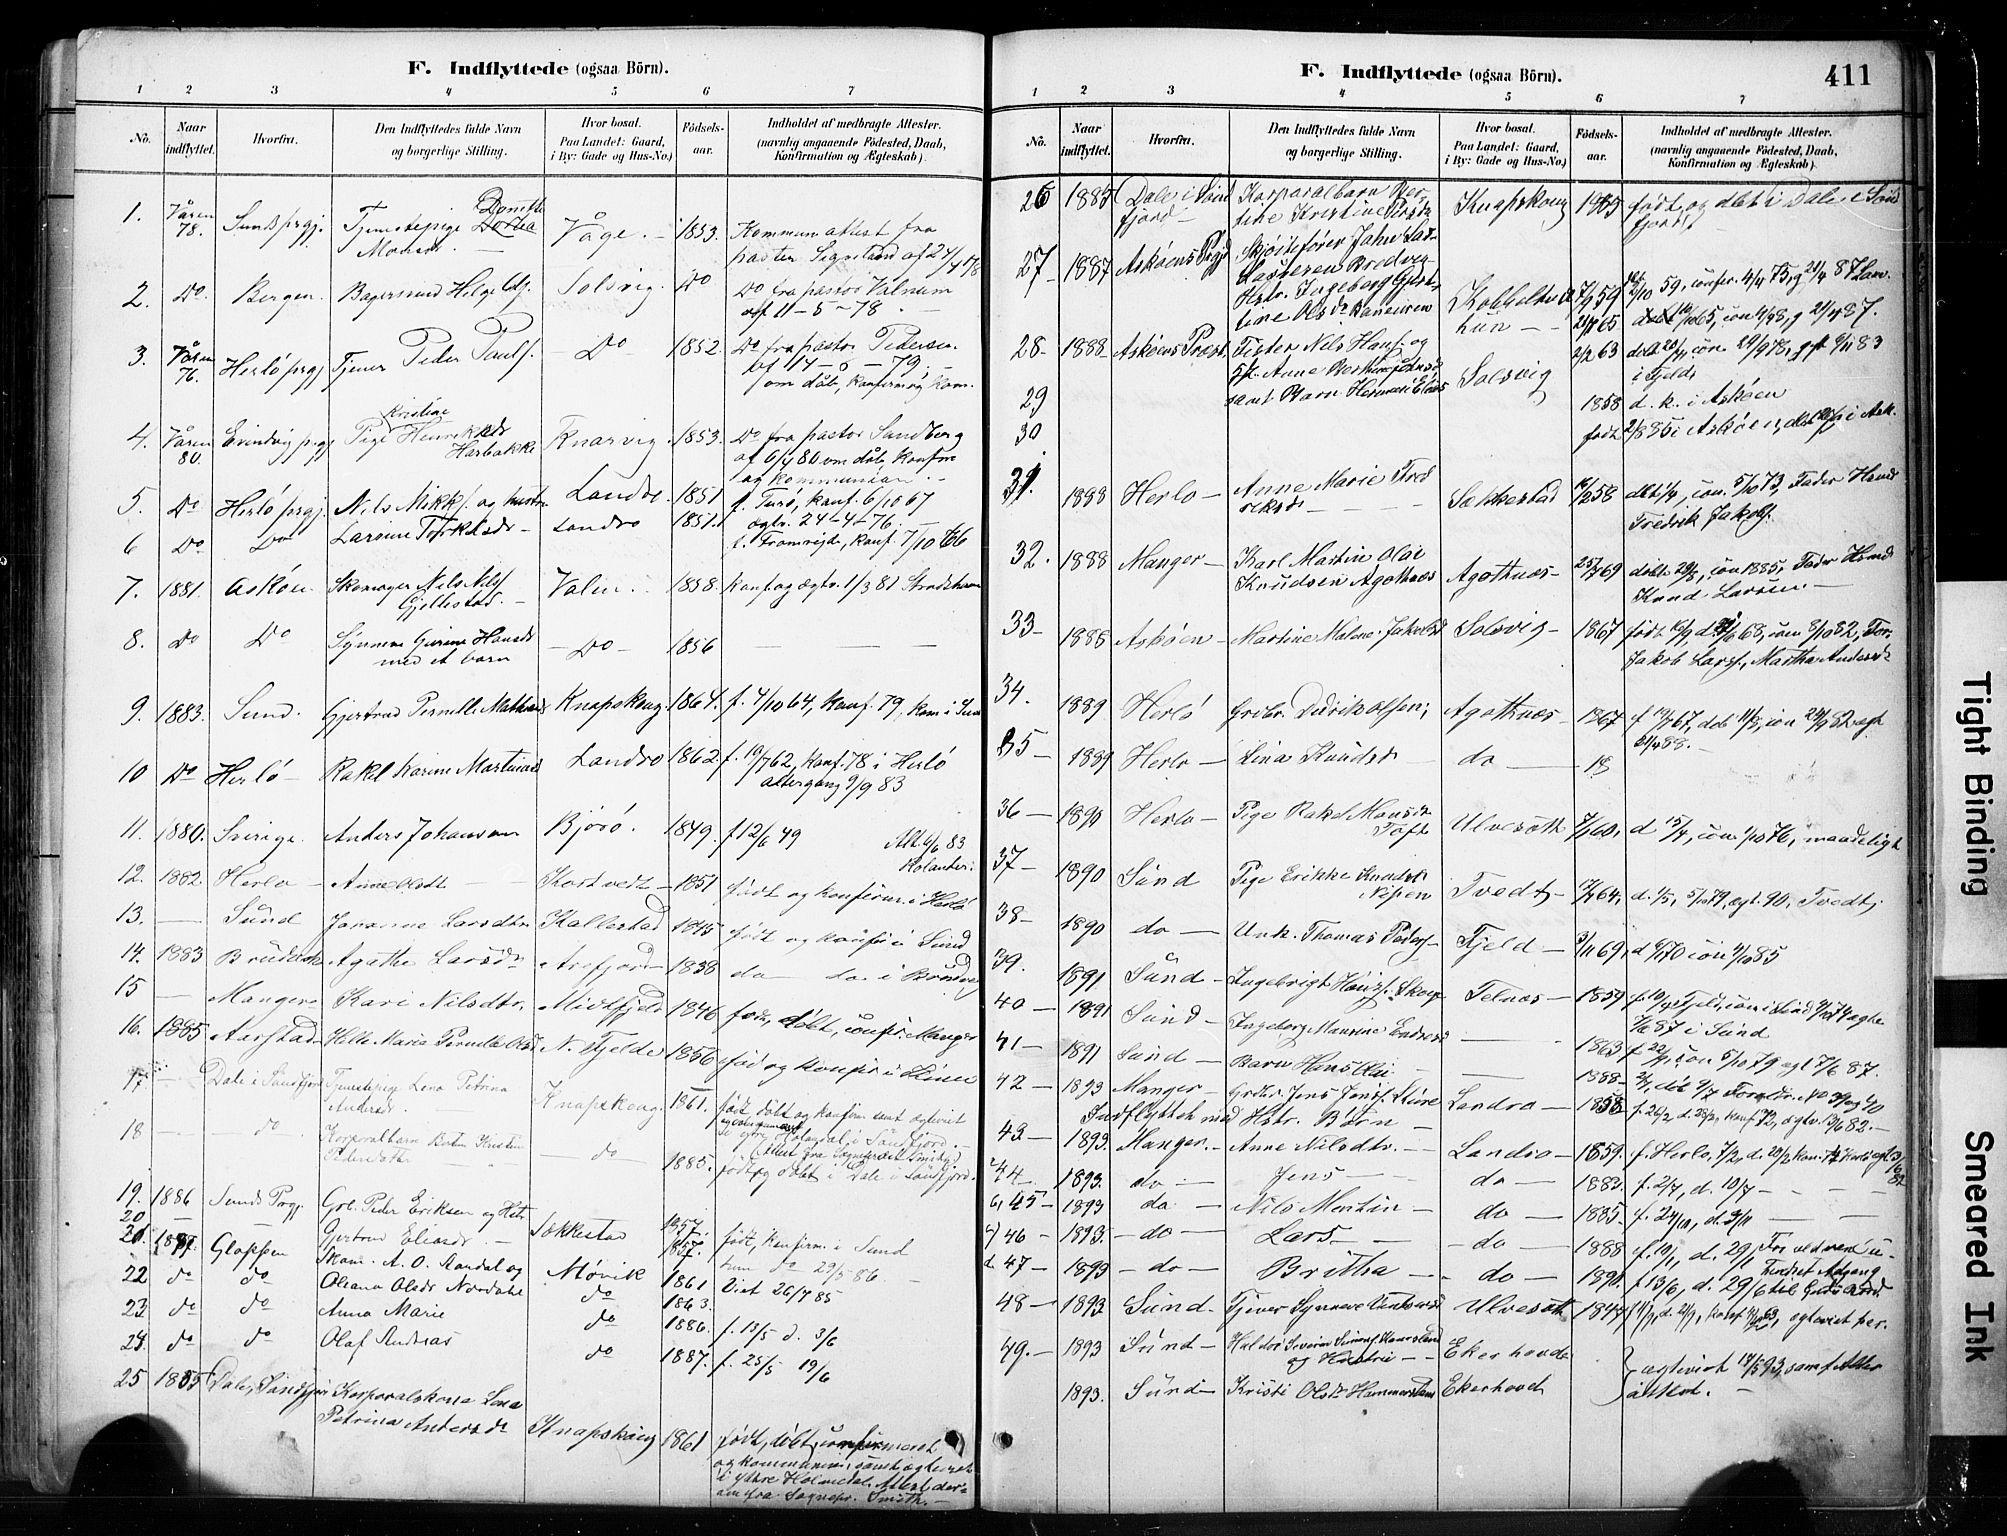 SAB, Fjell sokneprestembete, H/Hab: Klokkerbok nr. A 4, 1880-1899, s. 411